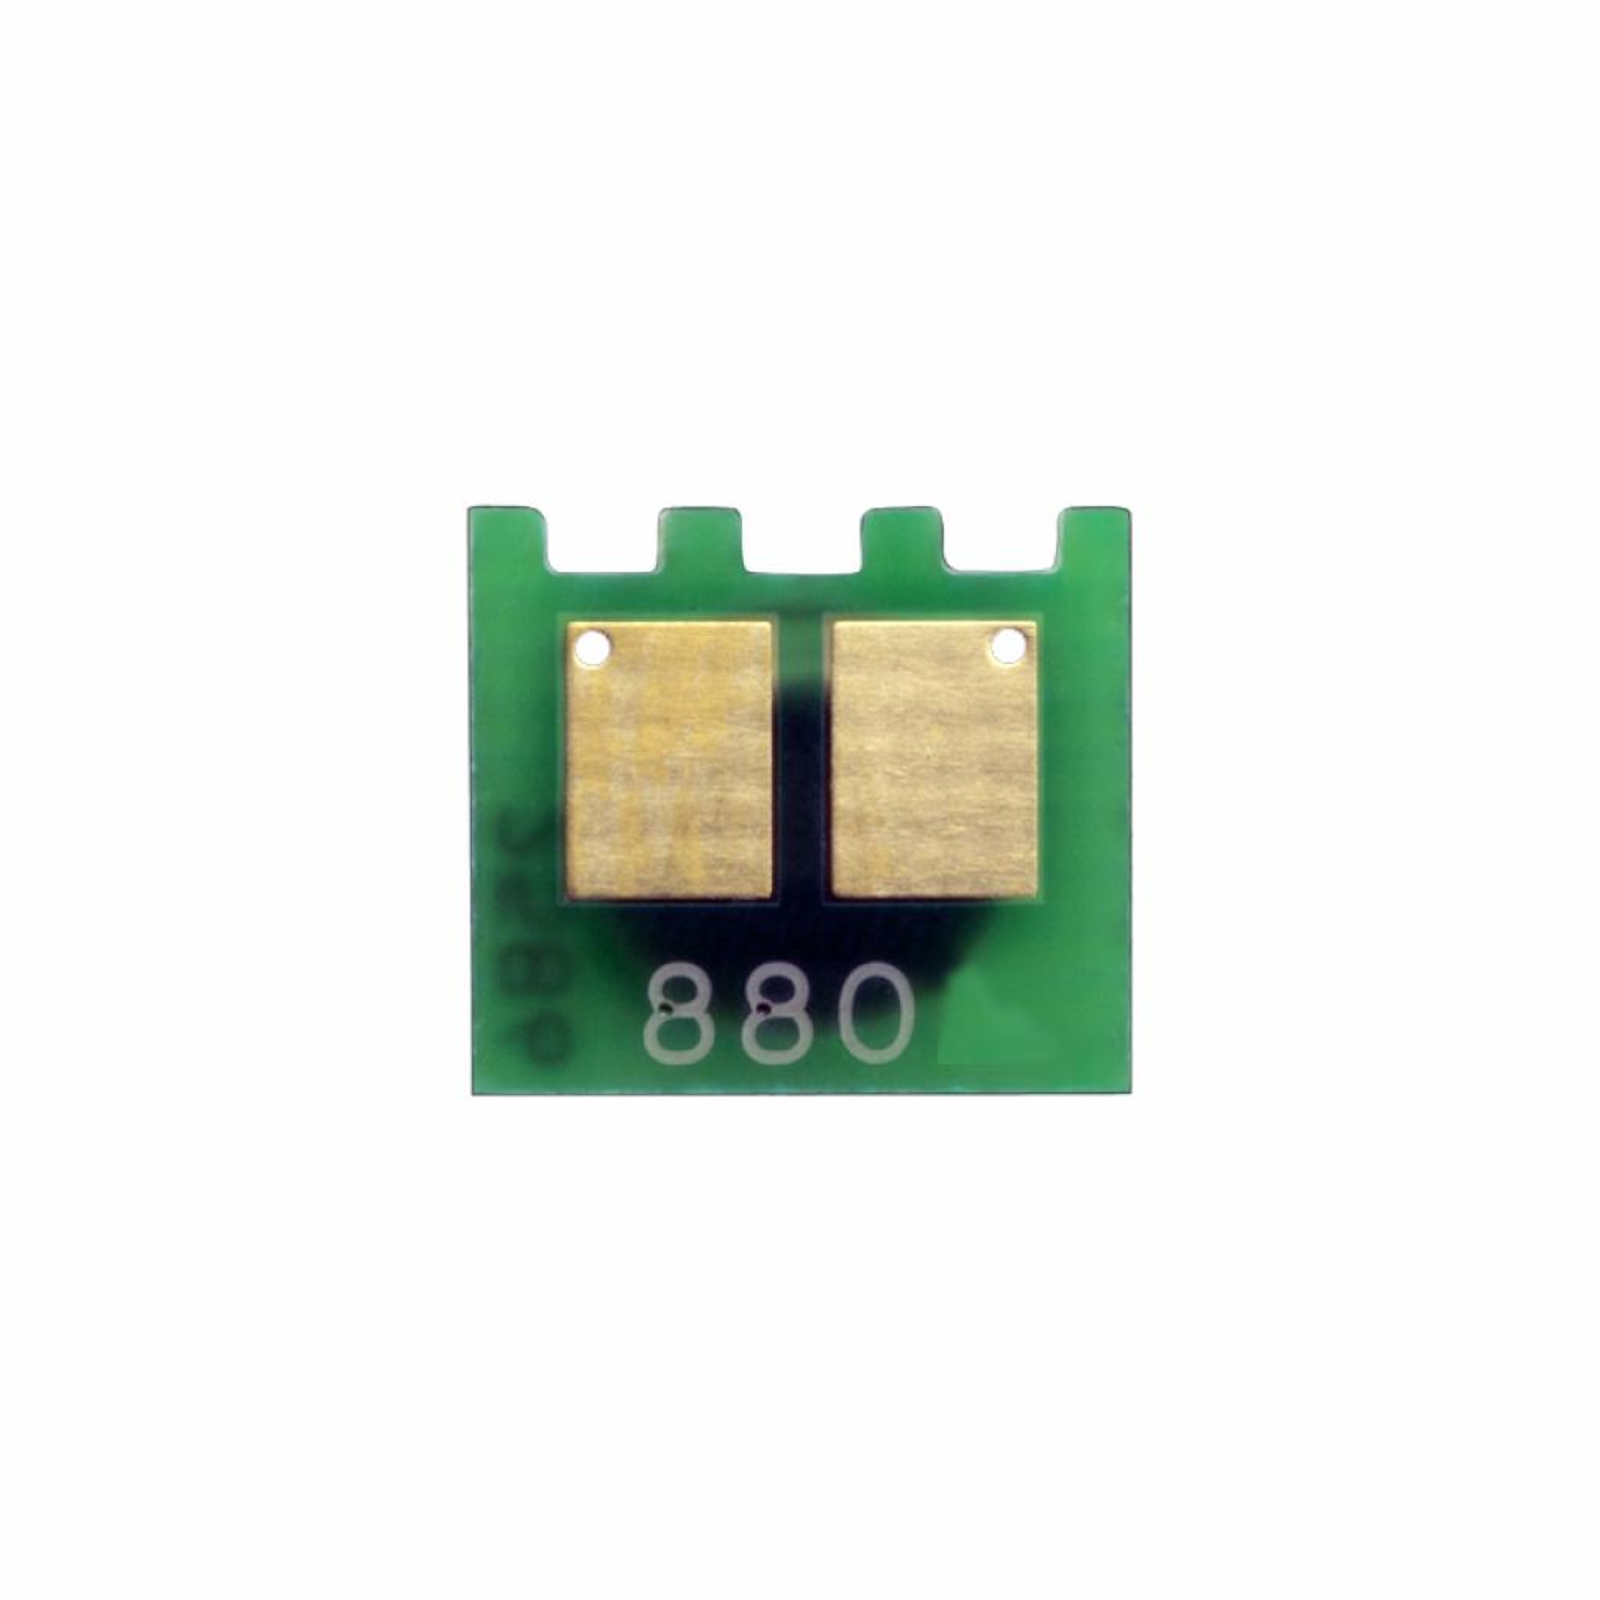 Чип для картриджа HP CLJ M880 (CF303A) 32k magenta Static Control (HP880CP-MA)